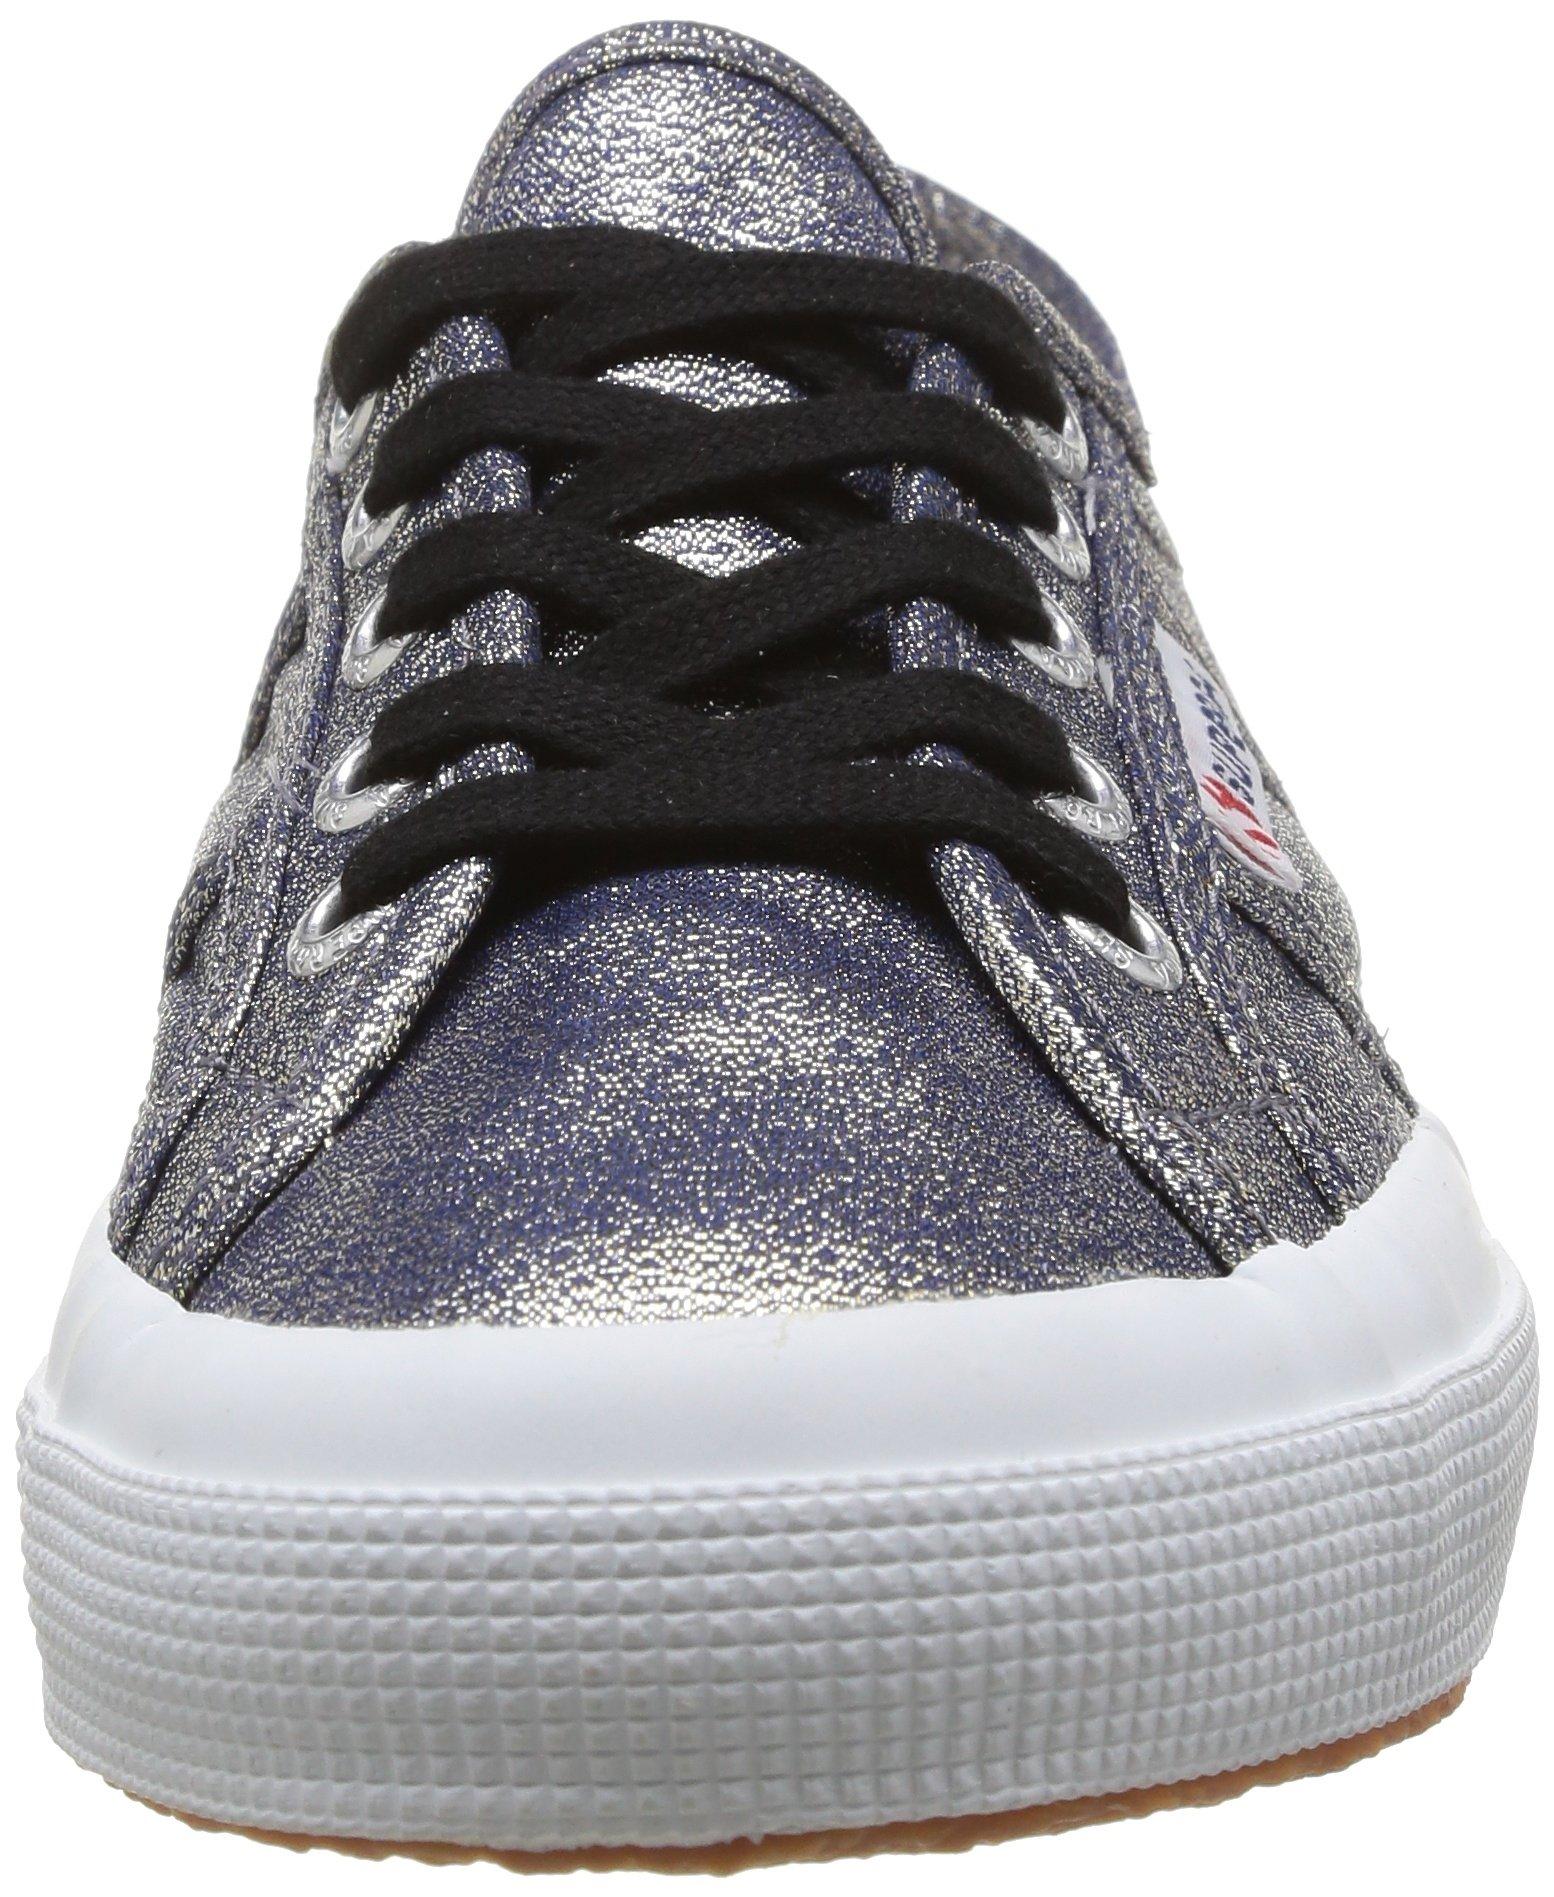 SUPERGA 2750-lamew, Sneaker Donna 4 spesavip